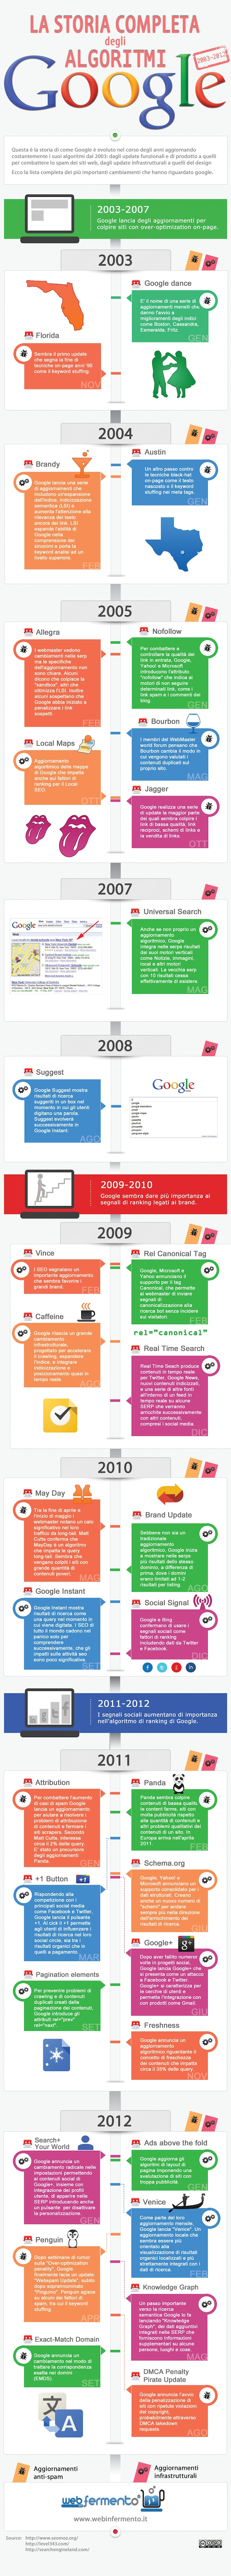 Google algoritmi infografica ITA